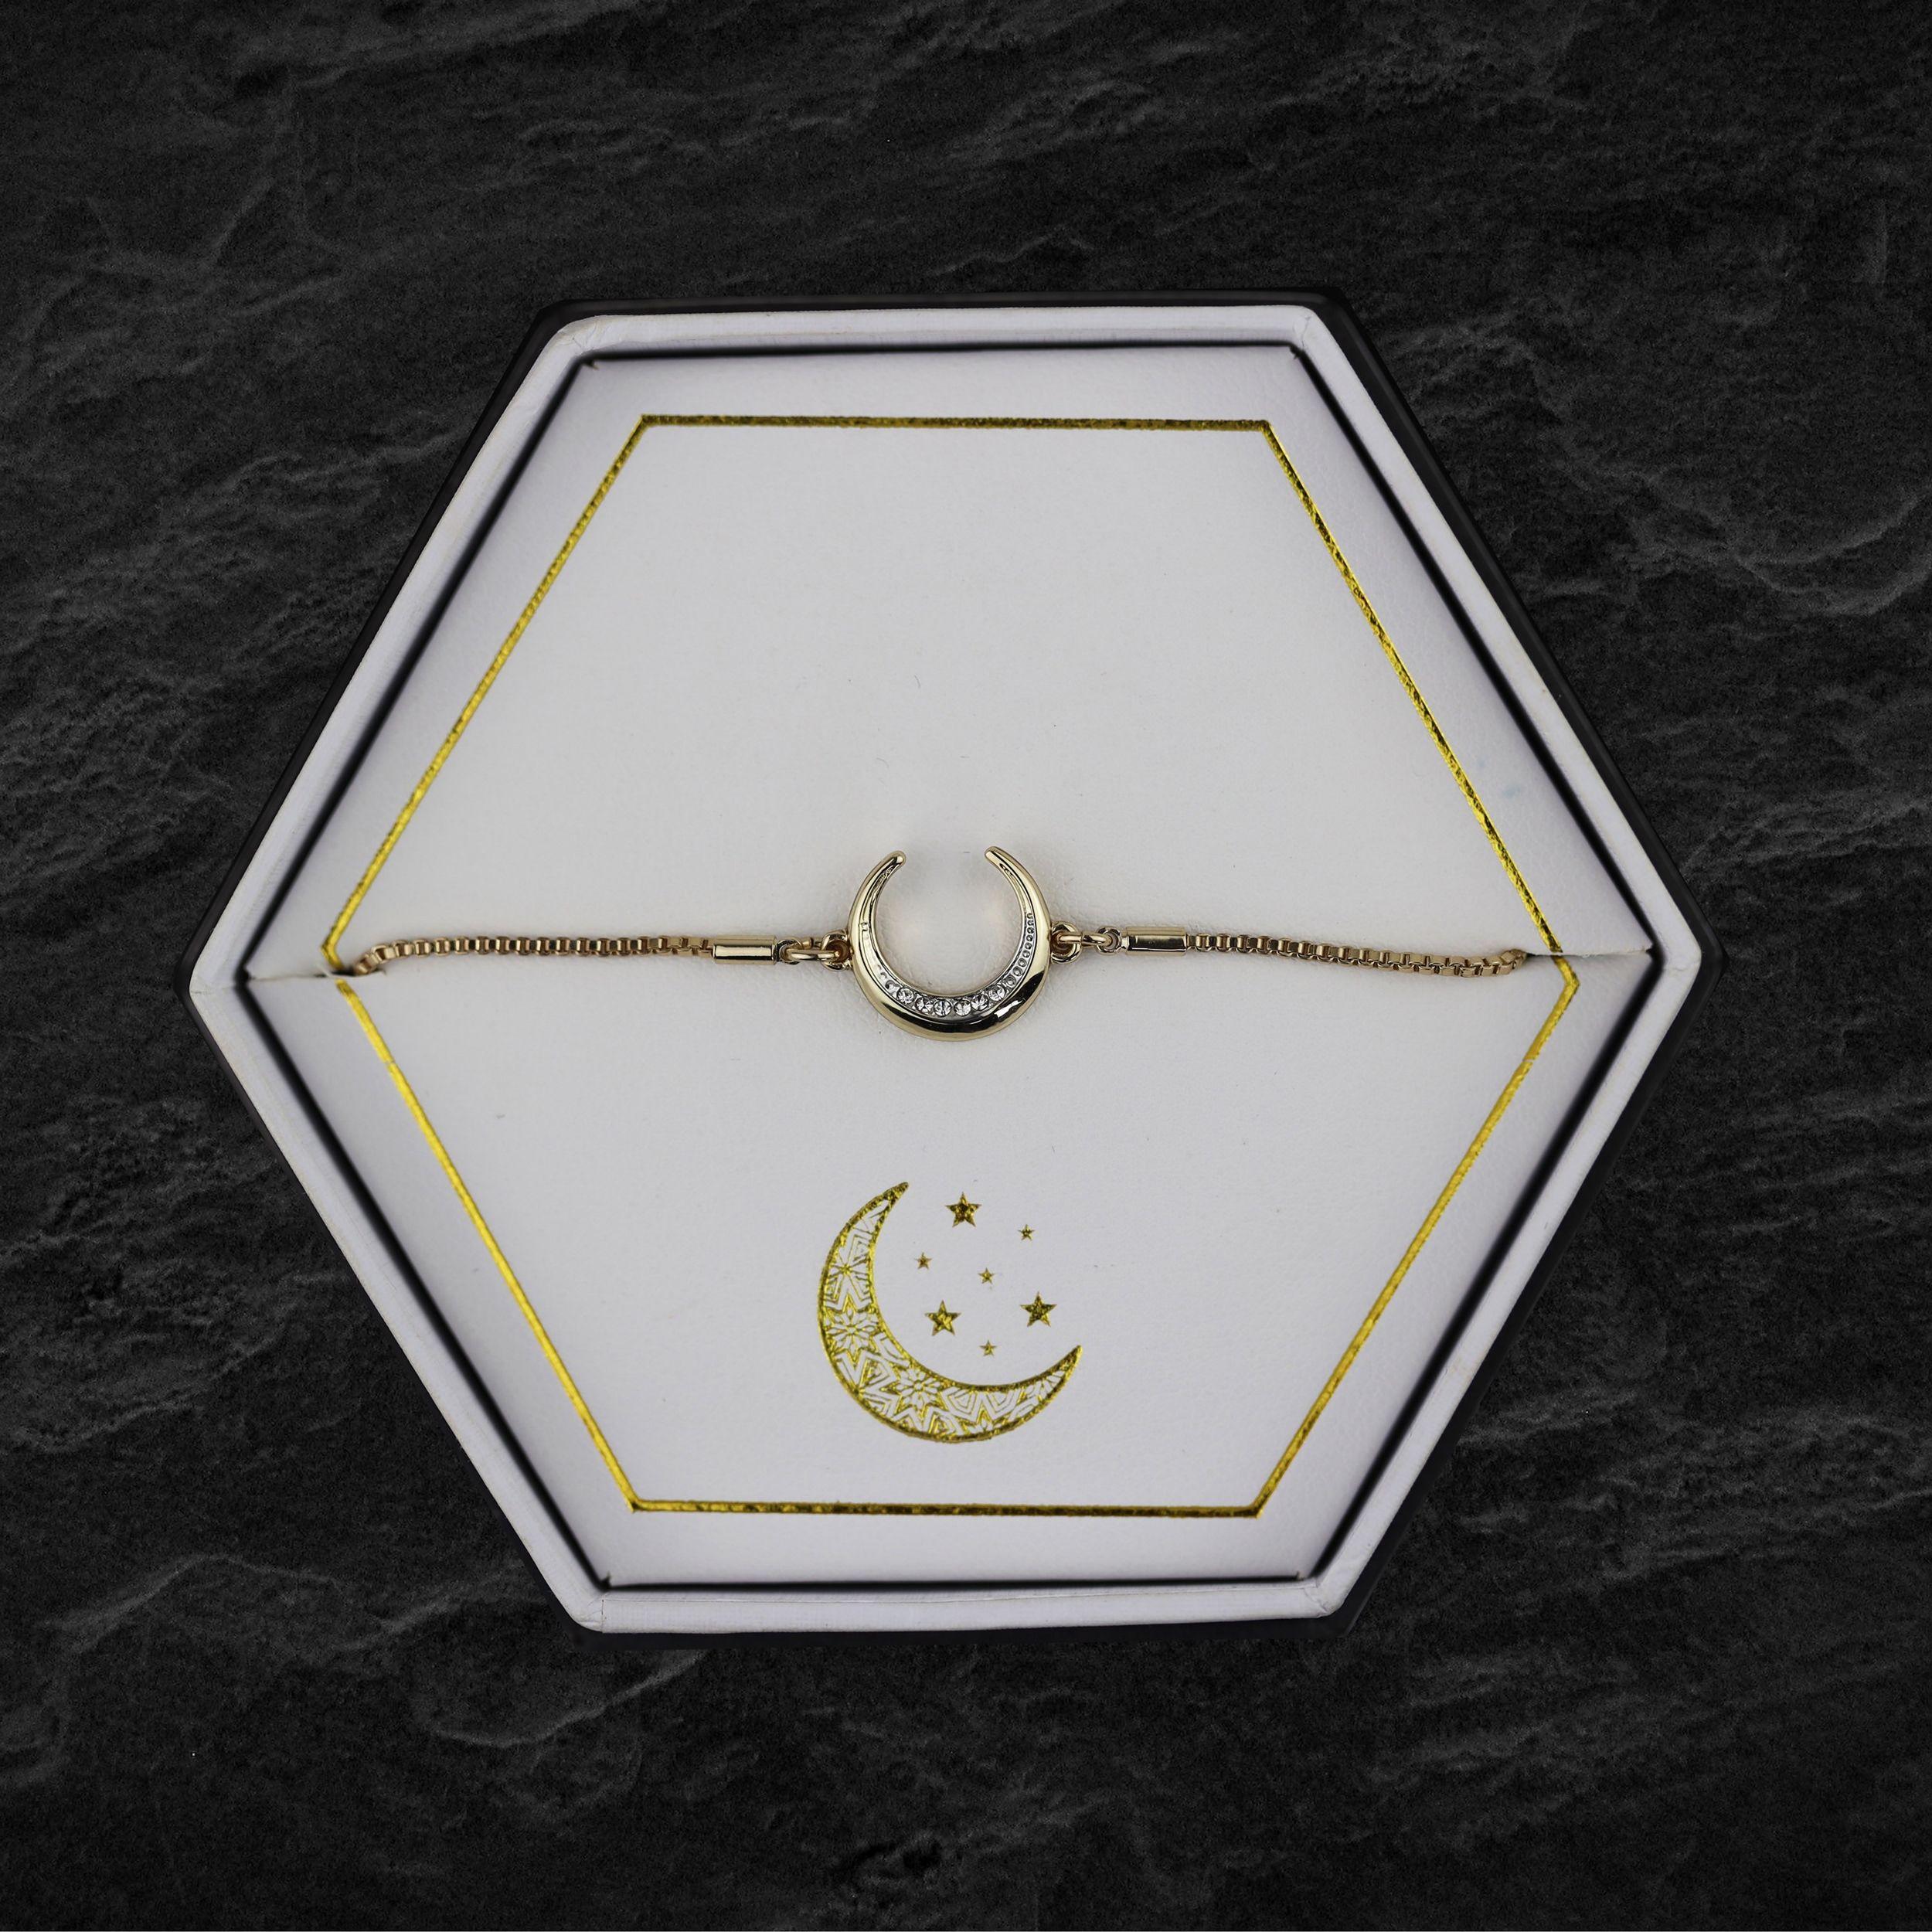 Buckley London Moonlight Bracelet Box